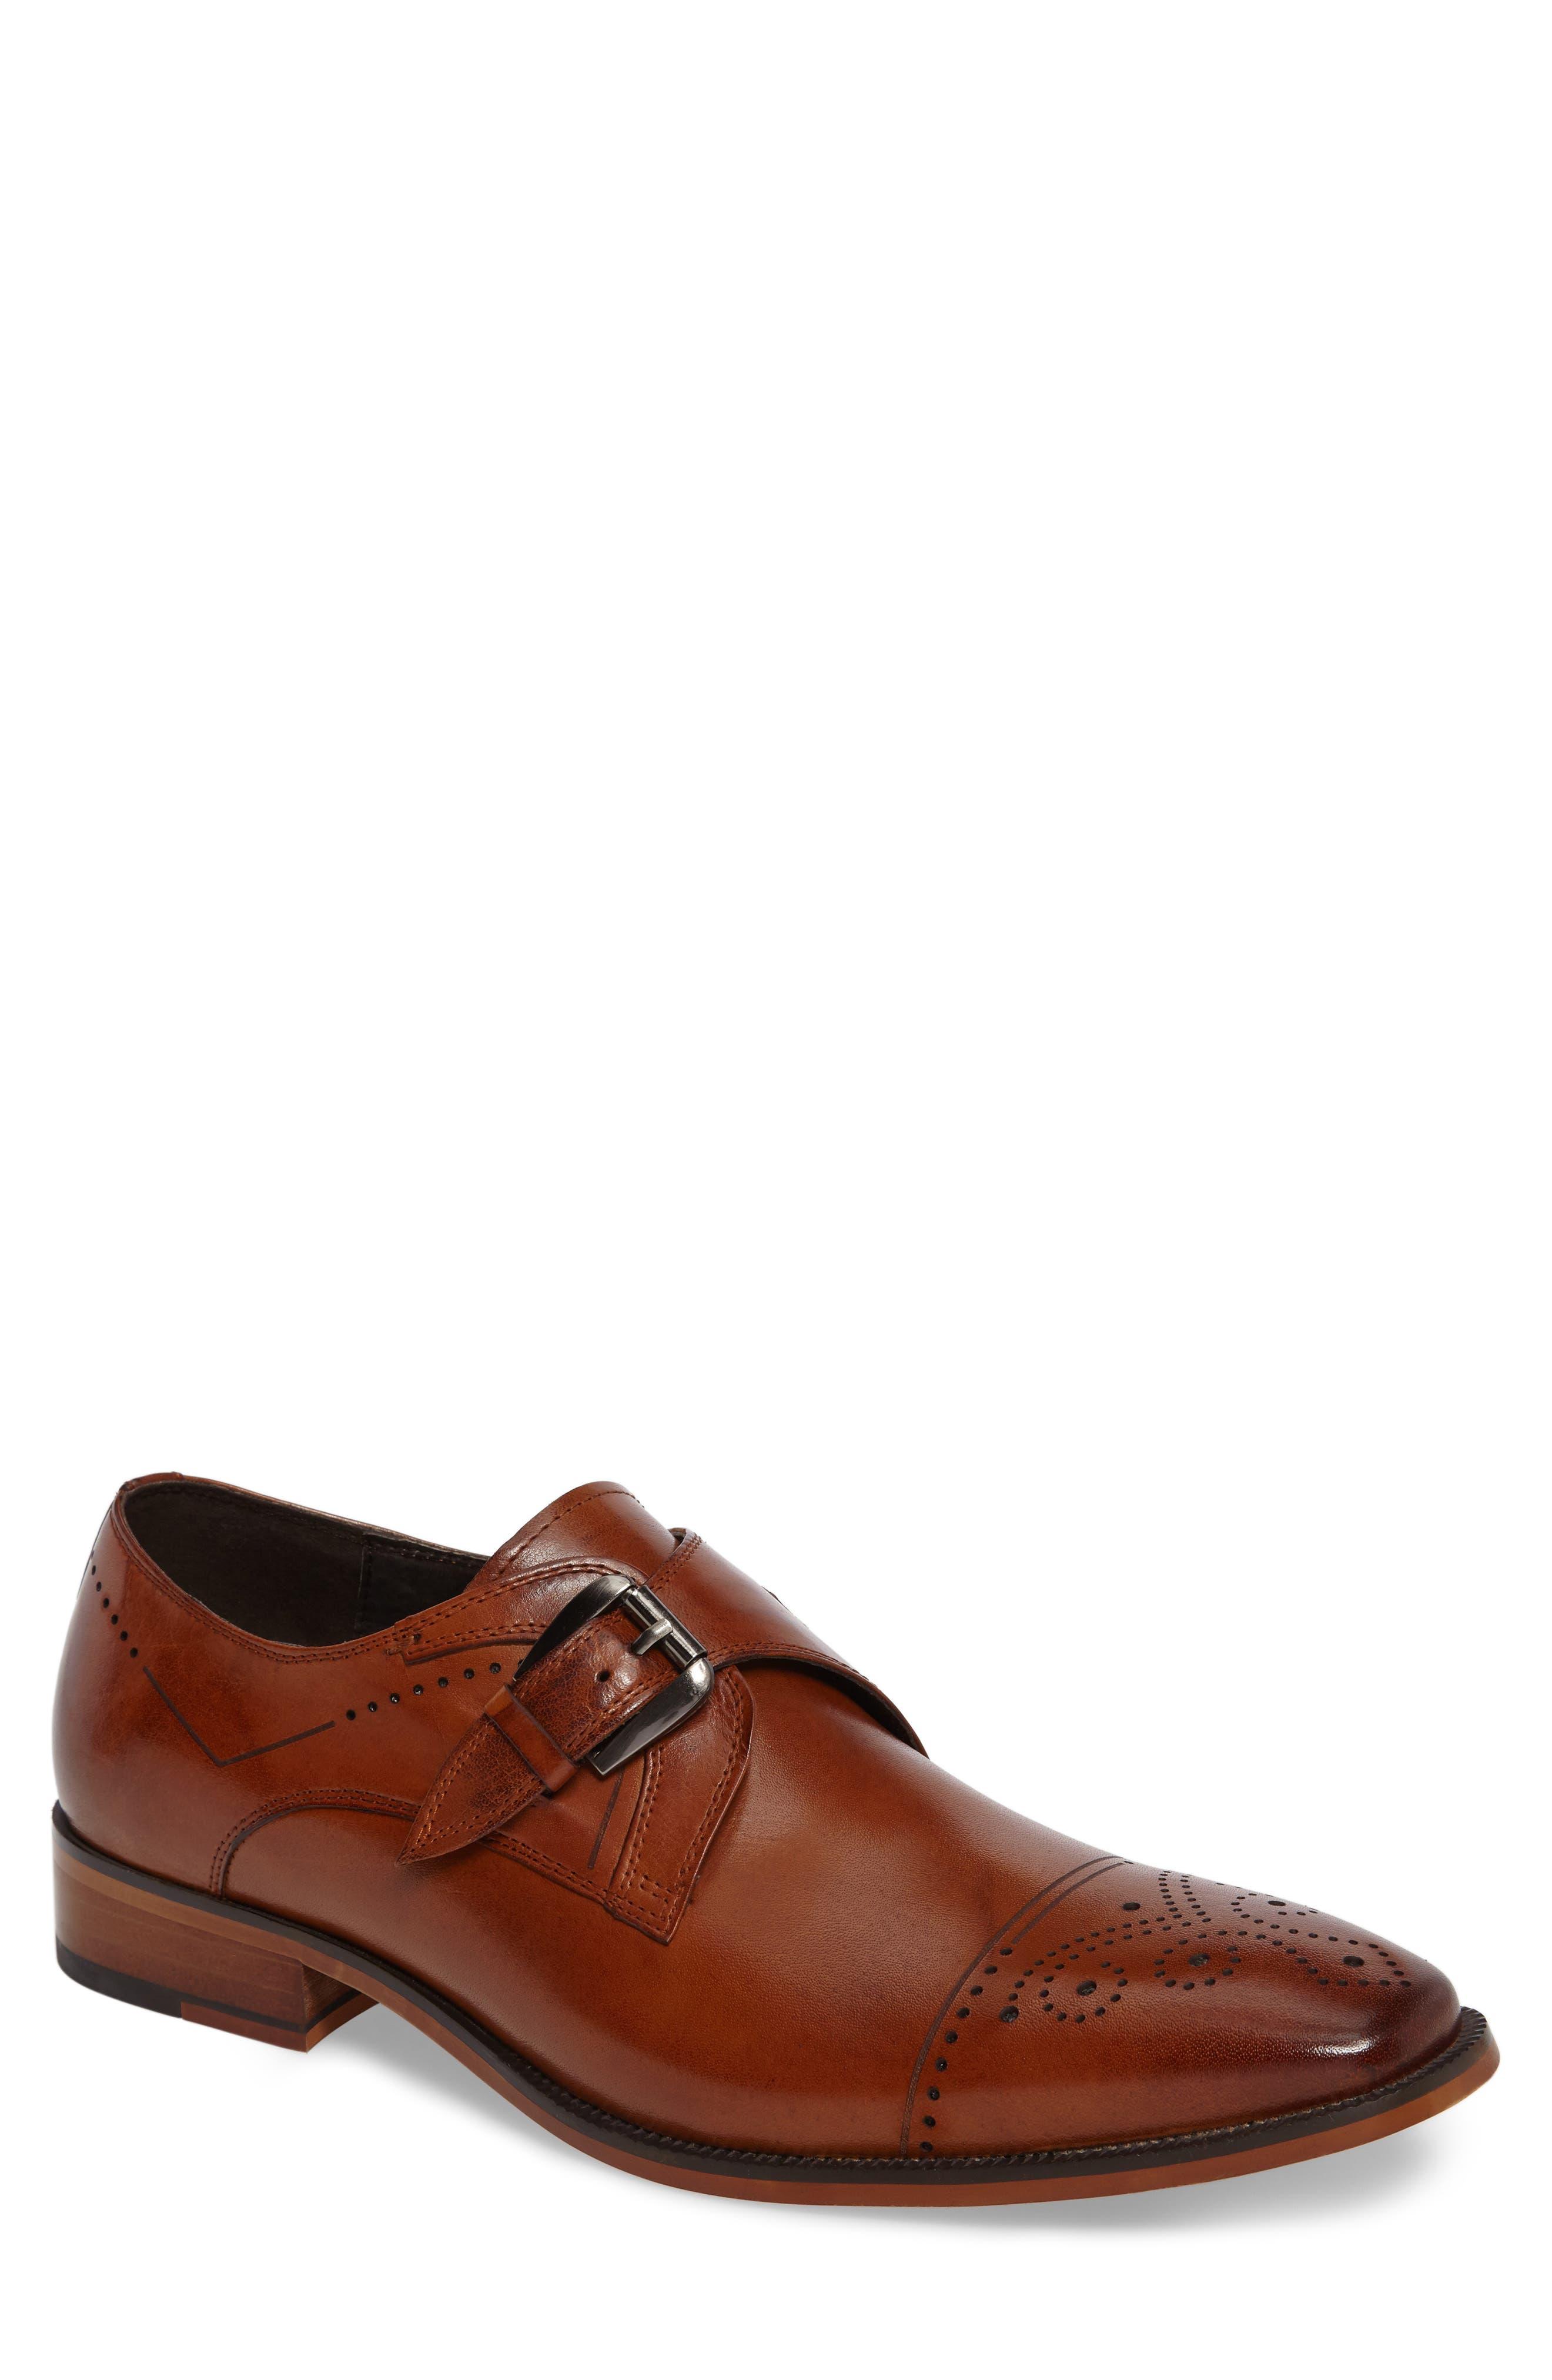 Alternate Image 1 Selected - Stacy Adams Kimball Monk Strap Shoe (Men)